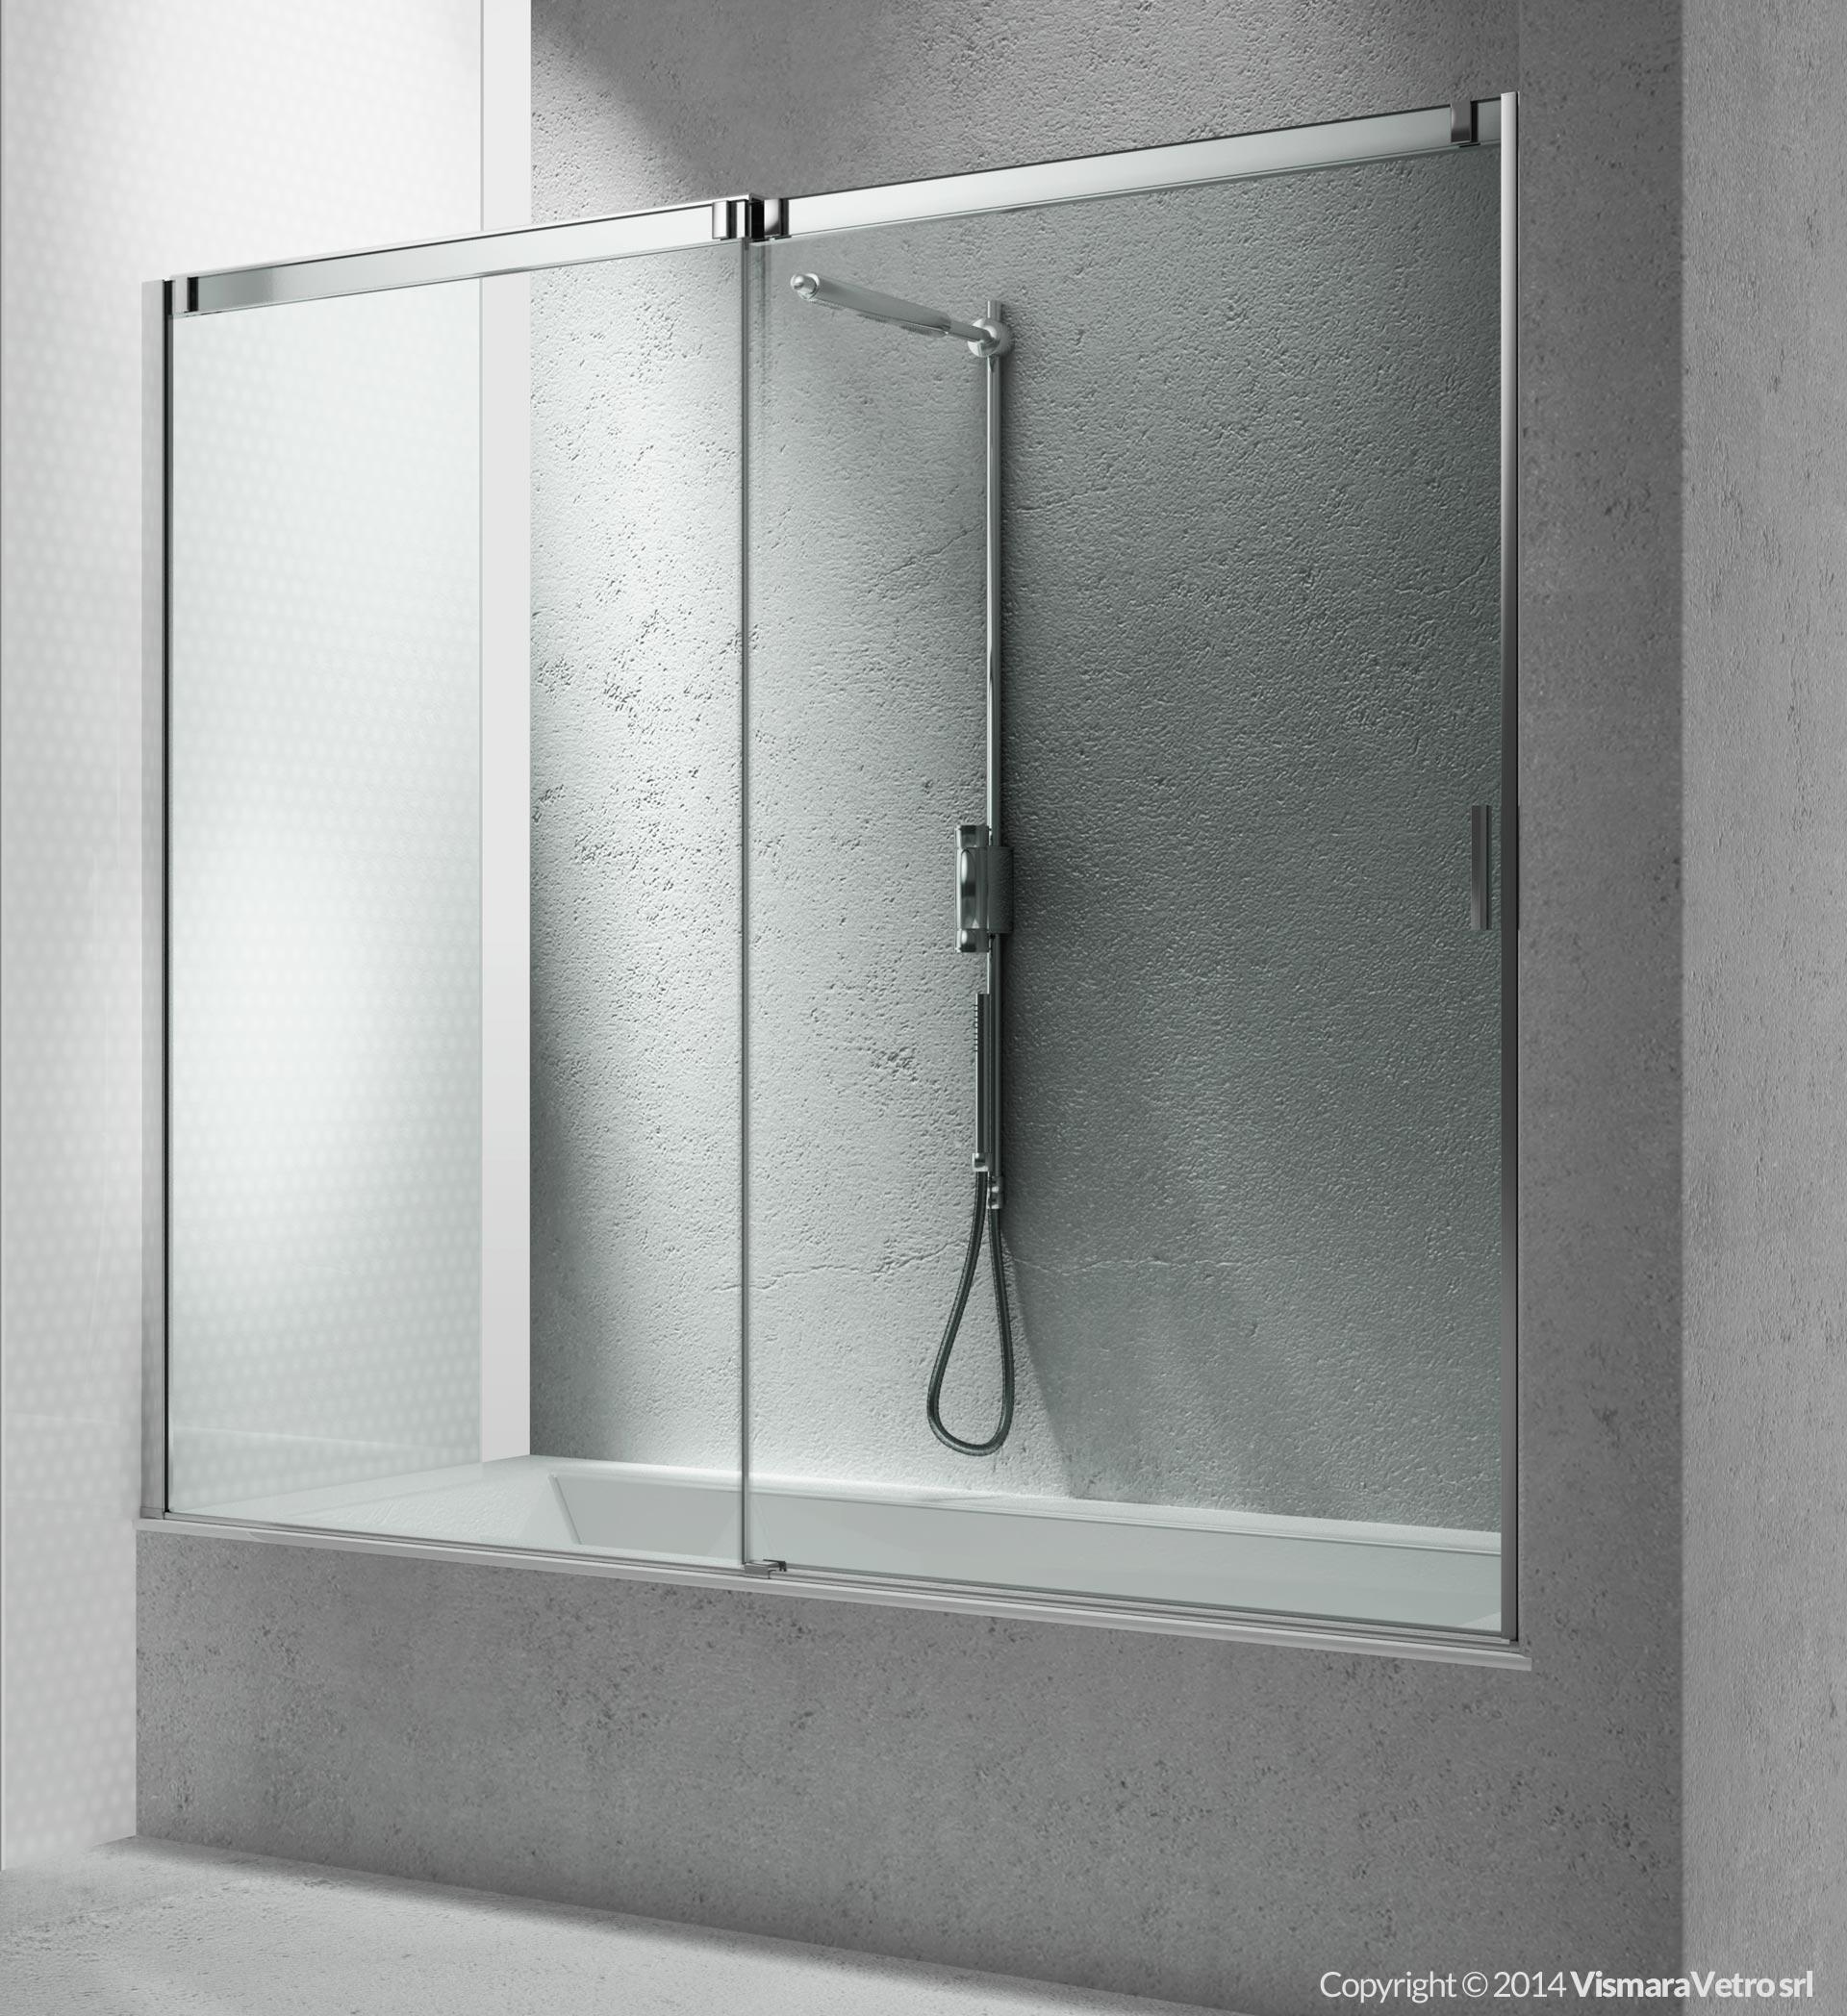 Vasche bn apertura scorrevole - Vasca da bagno in vetro ...